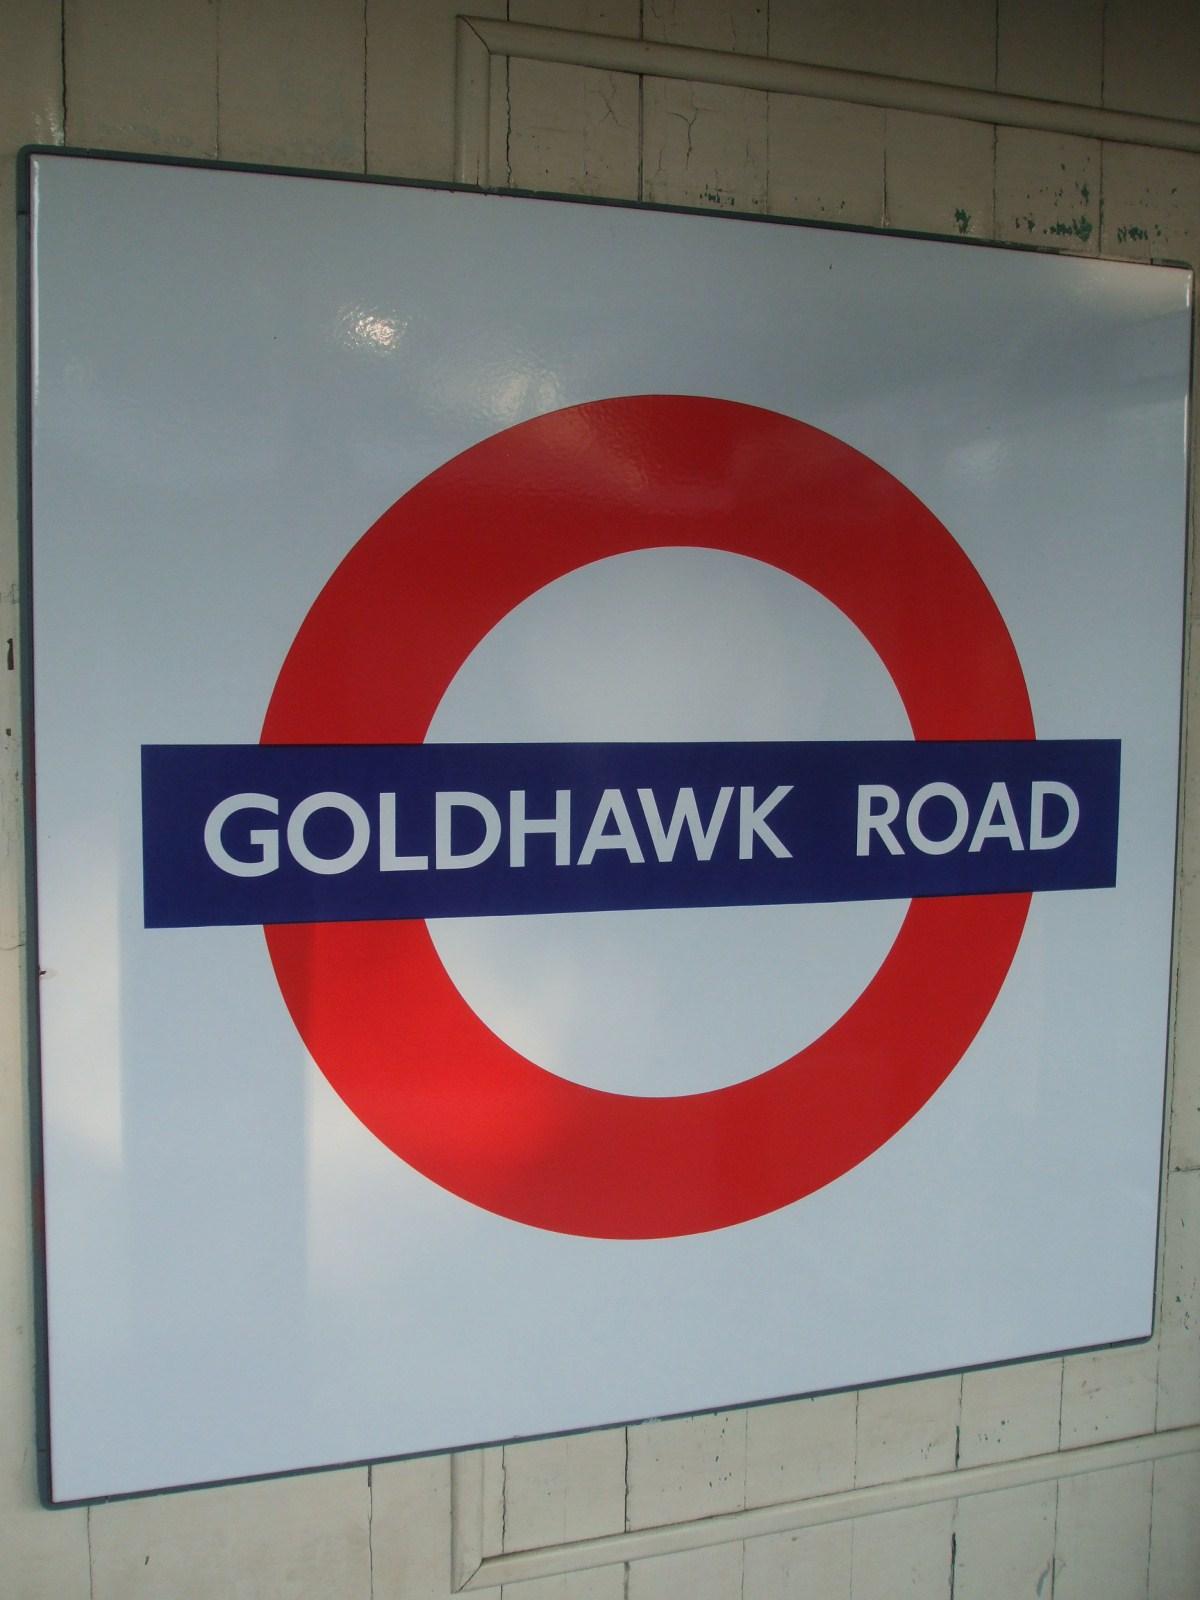 Goldhawk_road_stn_roundel.jpg